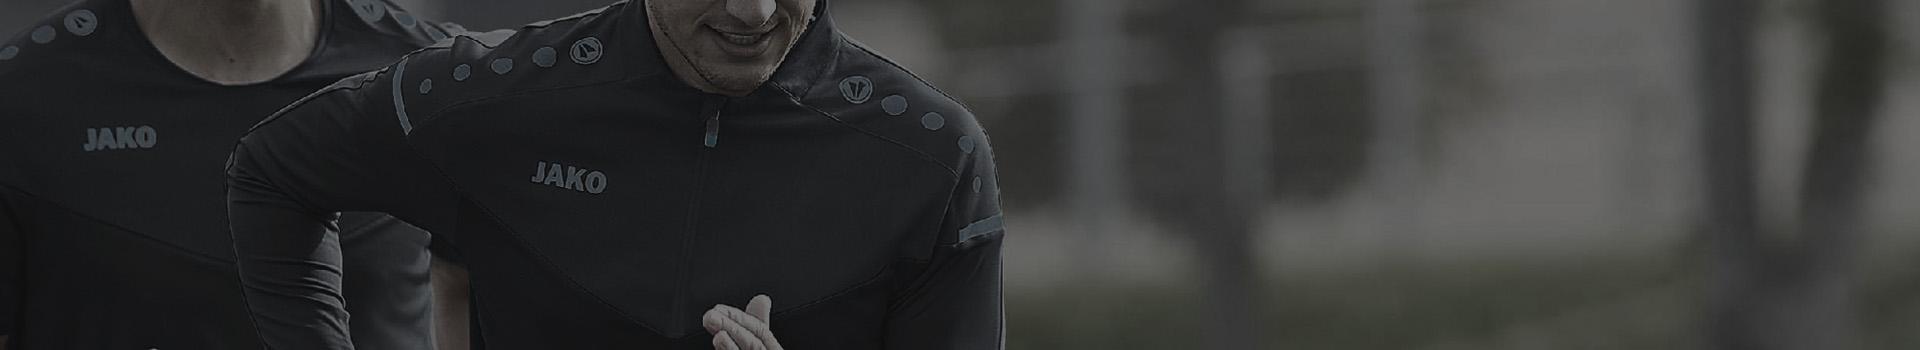 Banner Teamwear